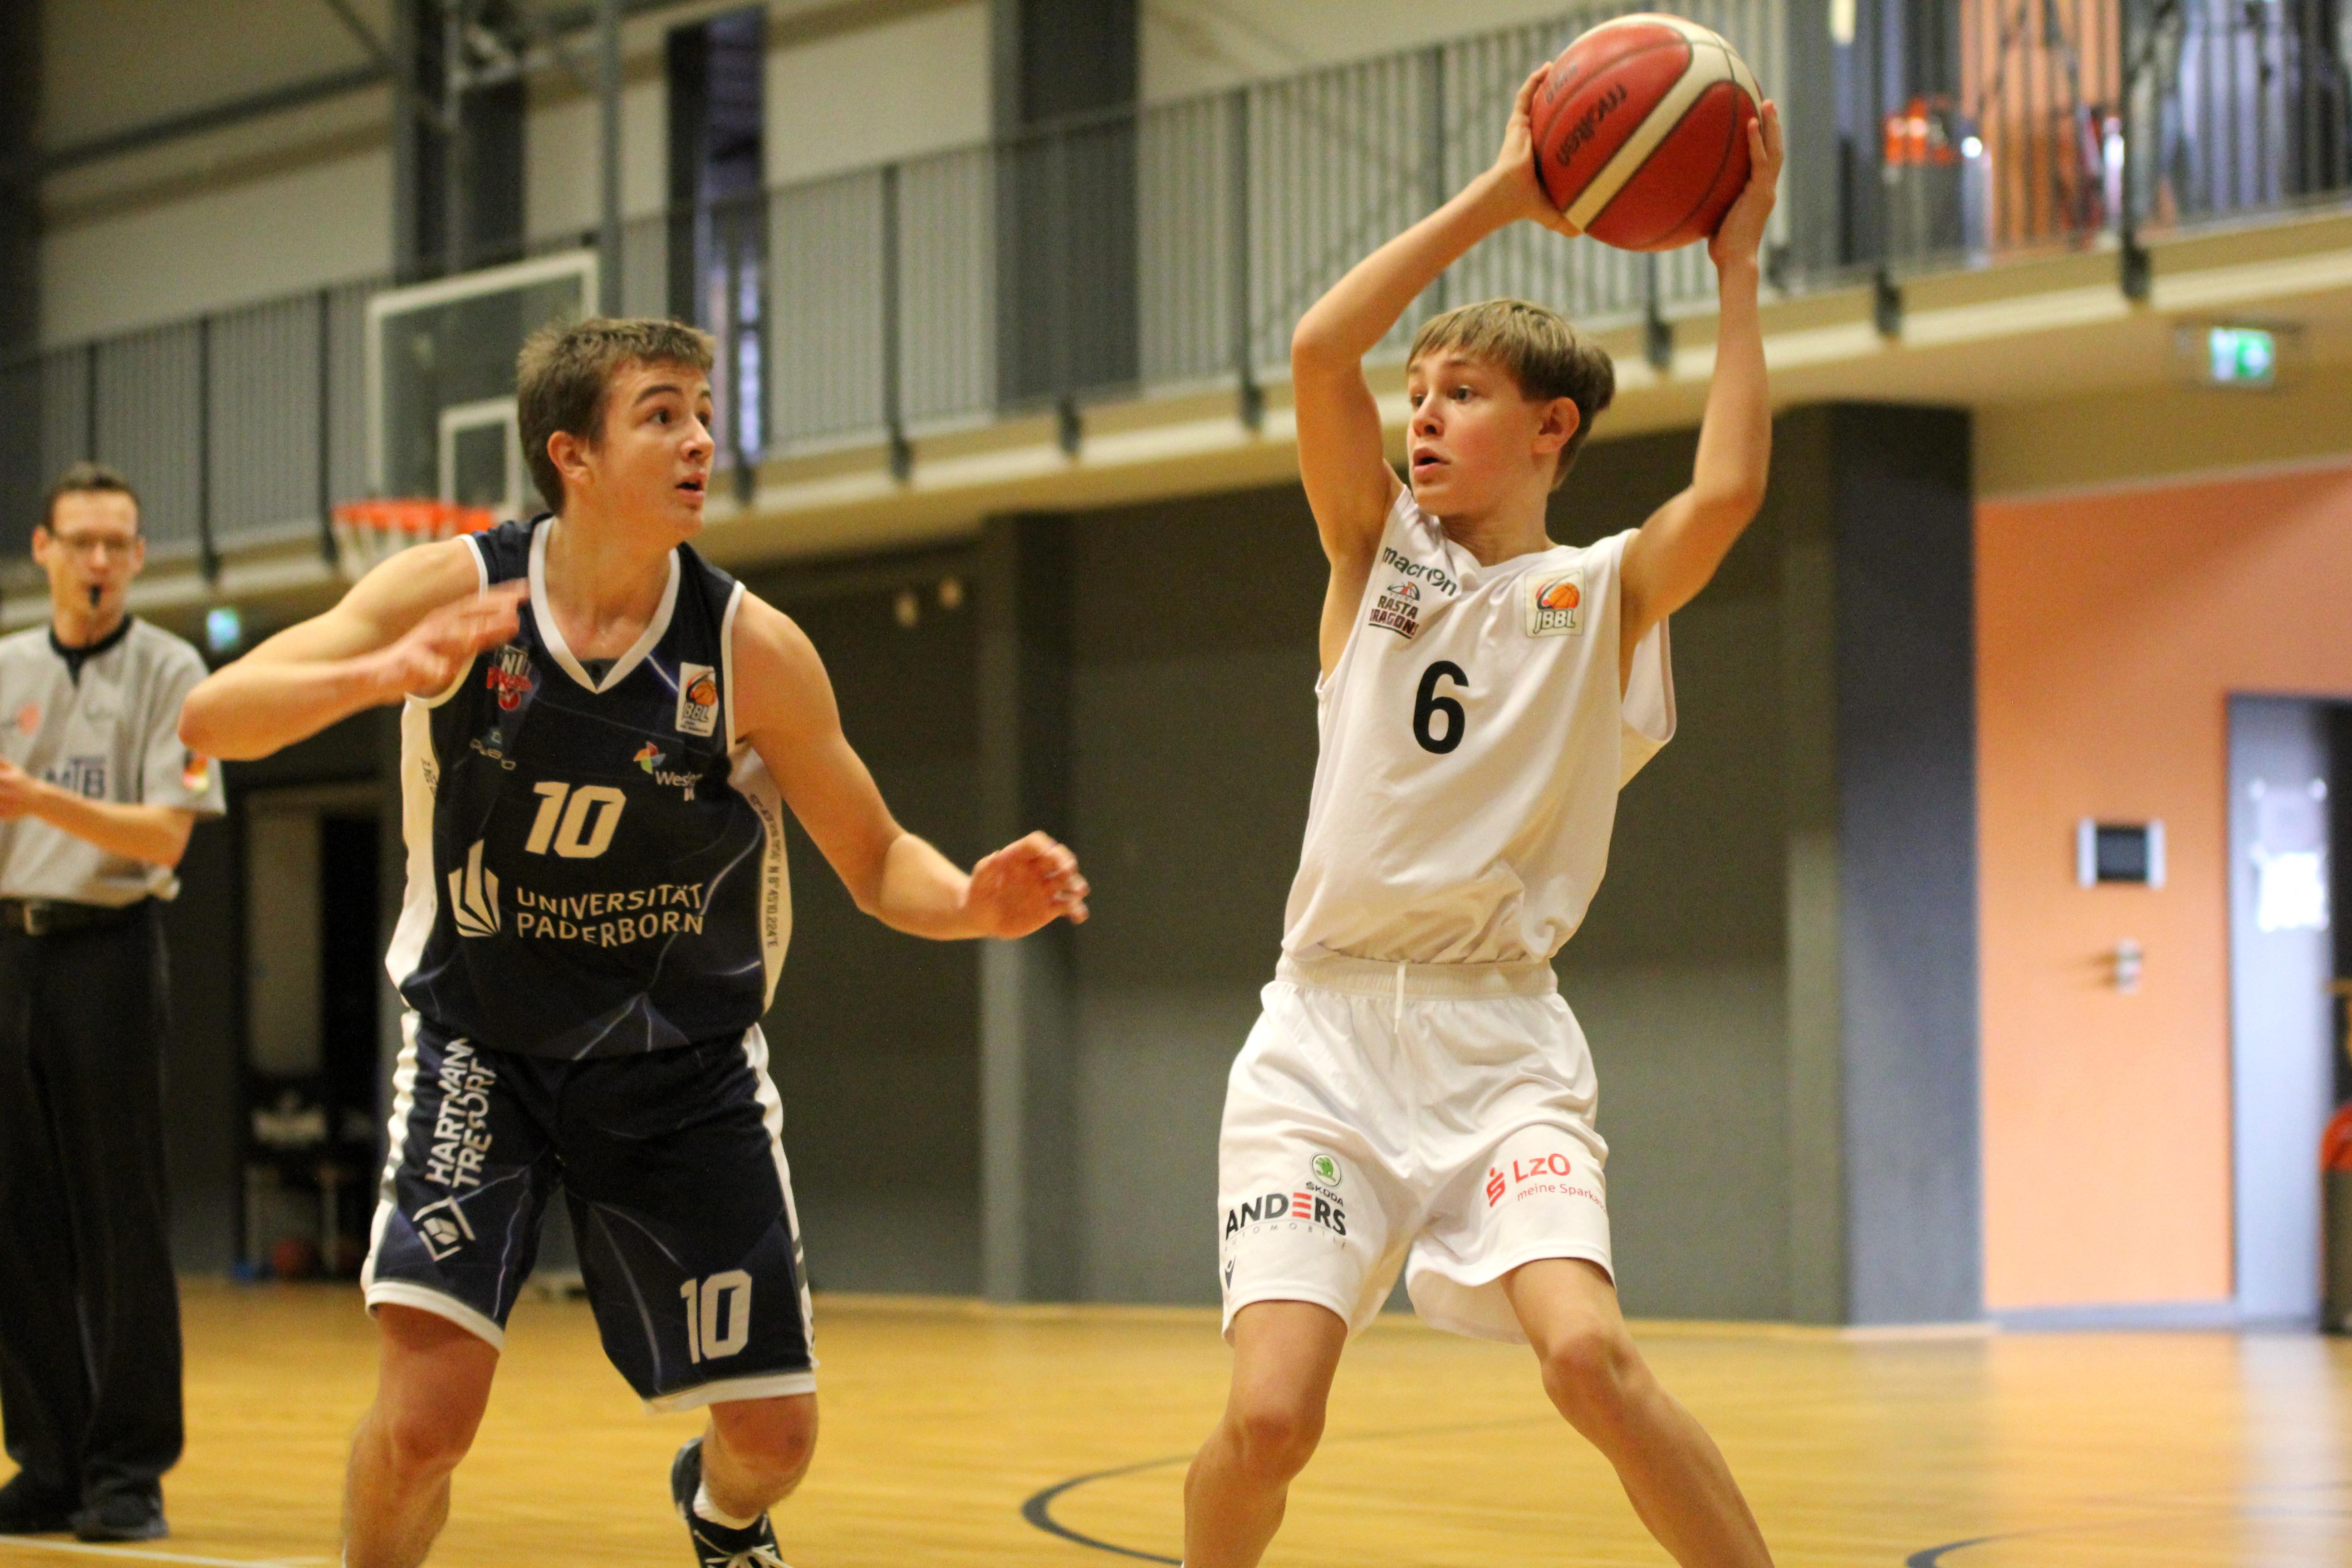 1_JBBL_20-21_YOUNG-RASTA-DRAGONS_Paderborn_Spieltag2_Johannes-Hellmann2